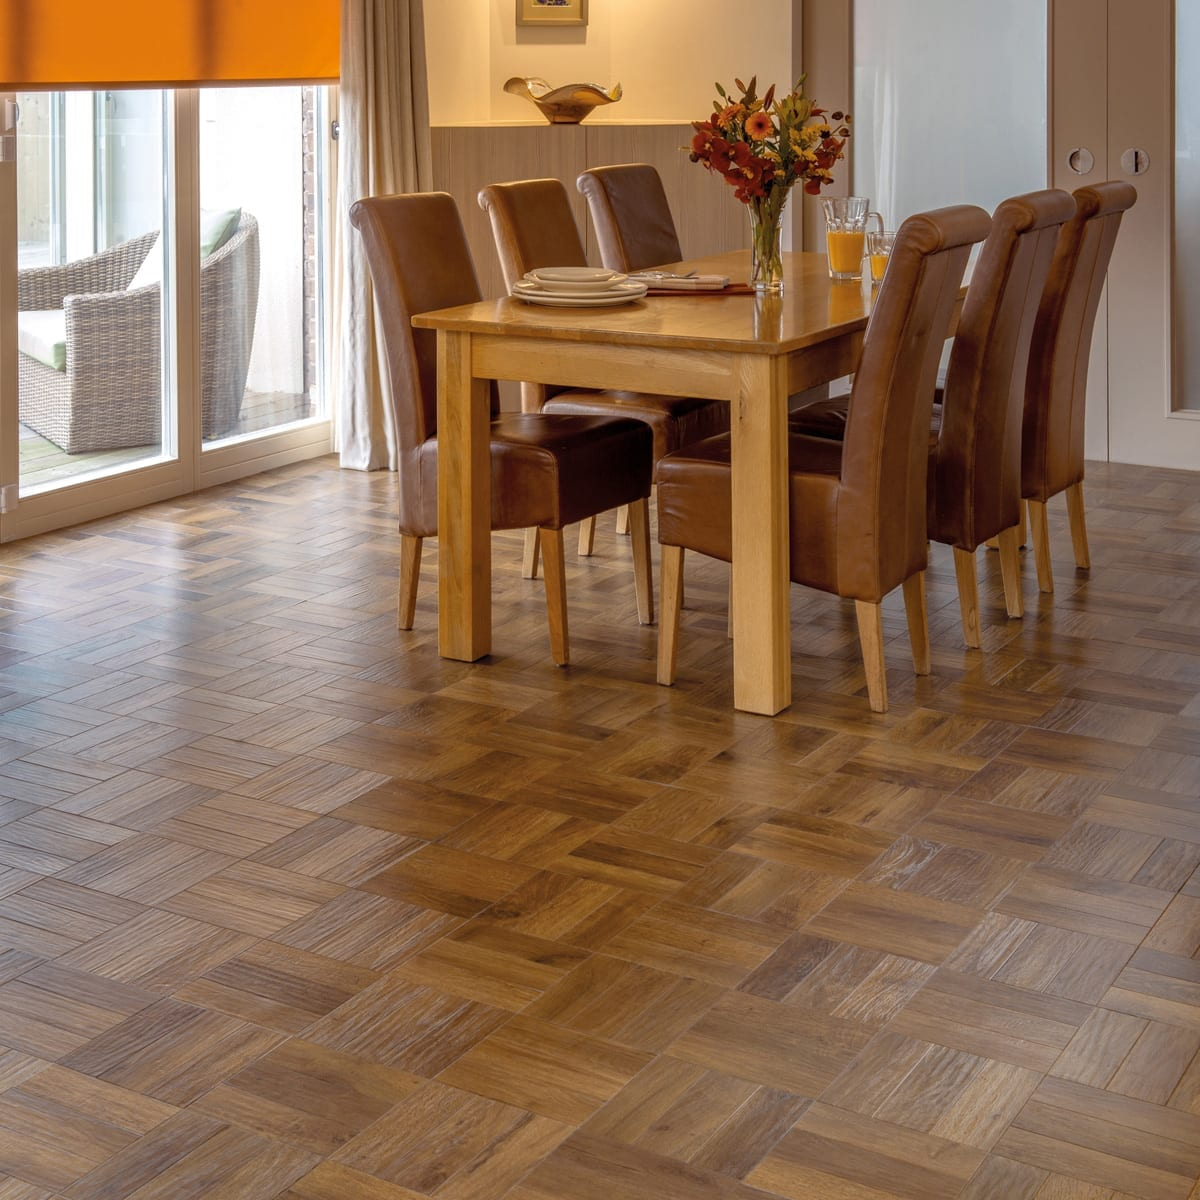 Dining Room Flooring: Karndean Art Select Parquet